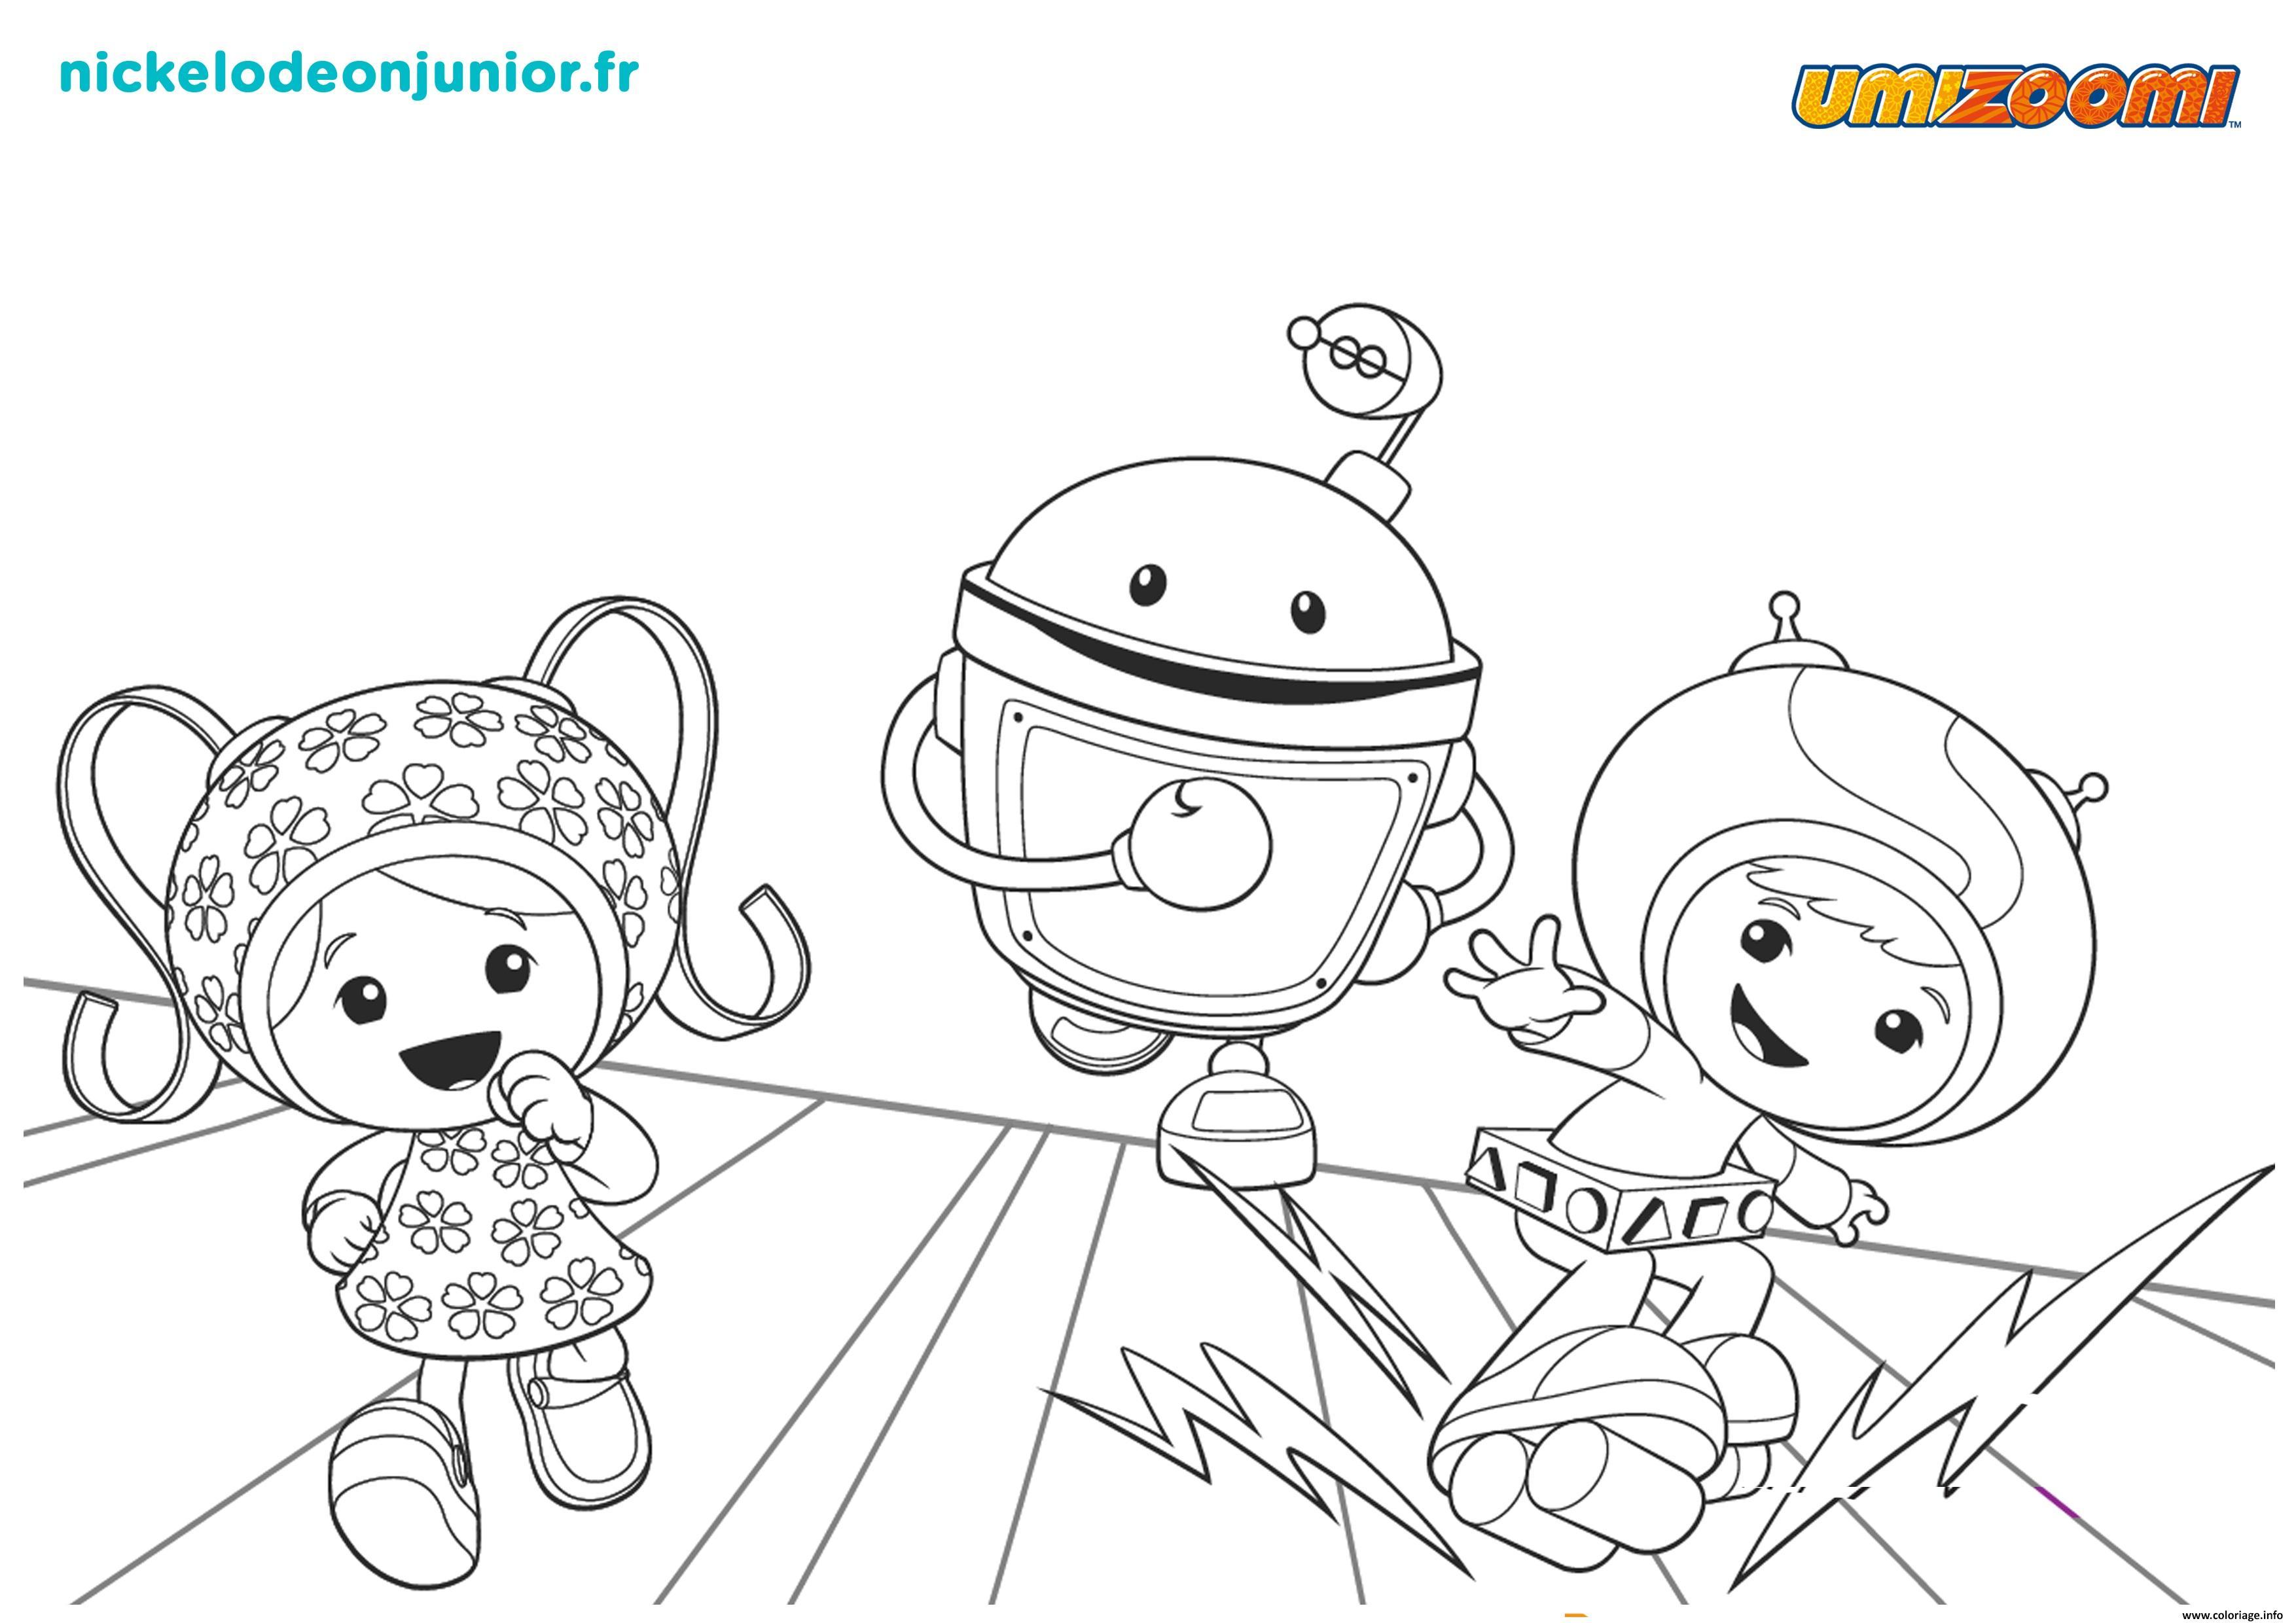 Coloriage la course umizoomi 2 dessin - Jeux de umizoomi ...